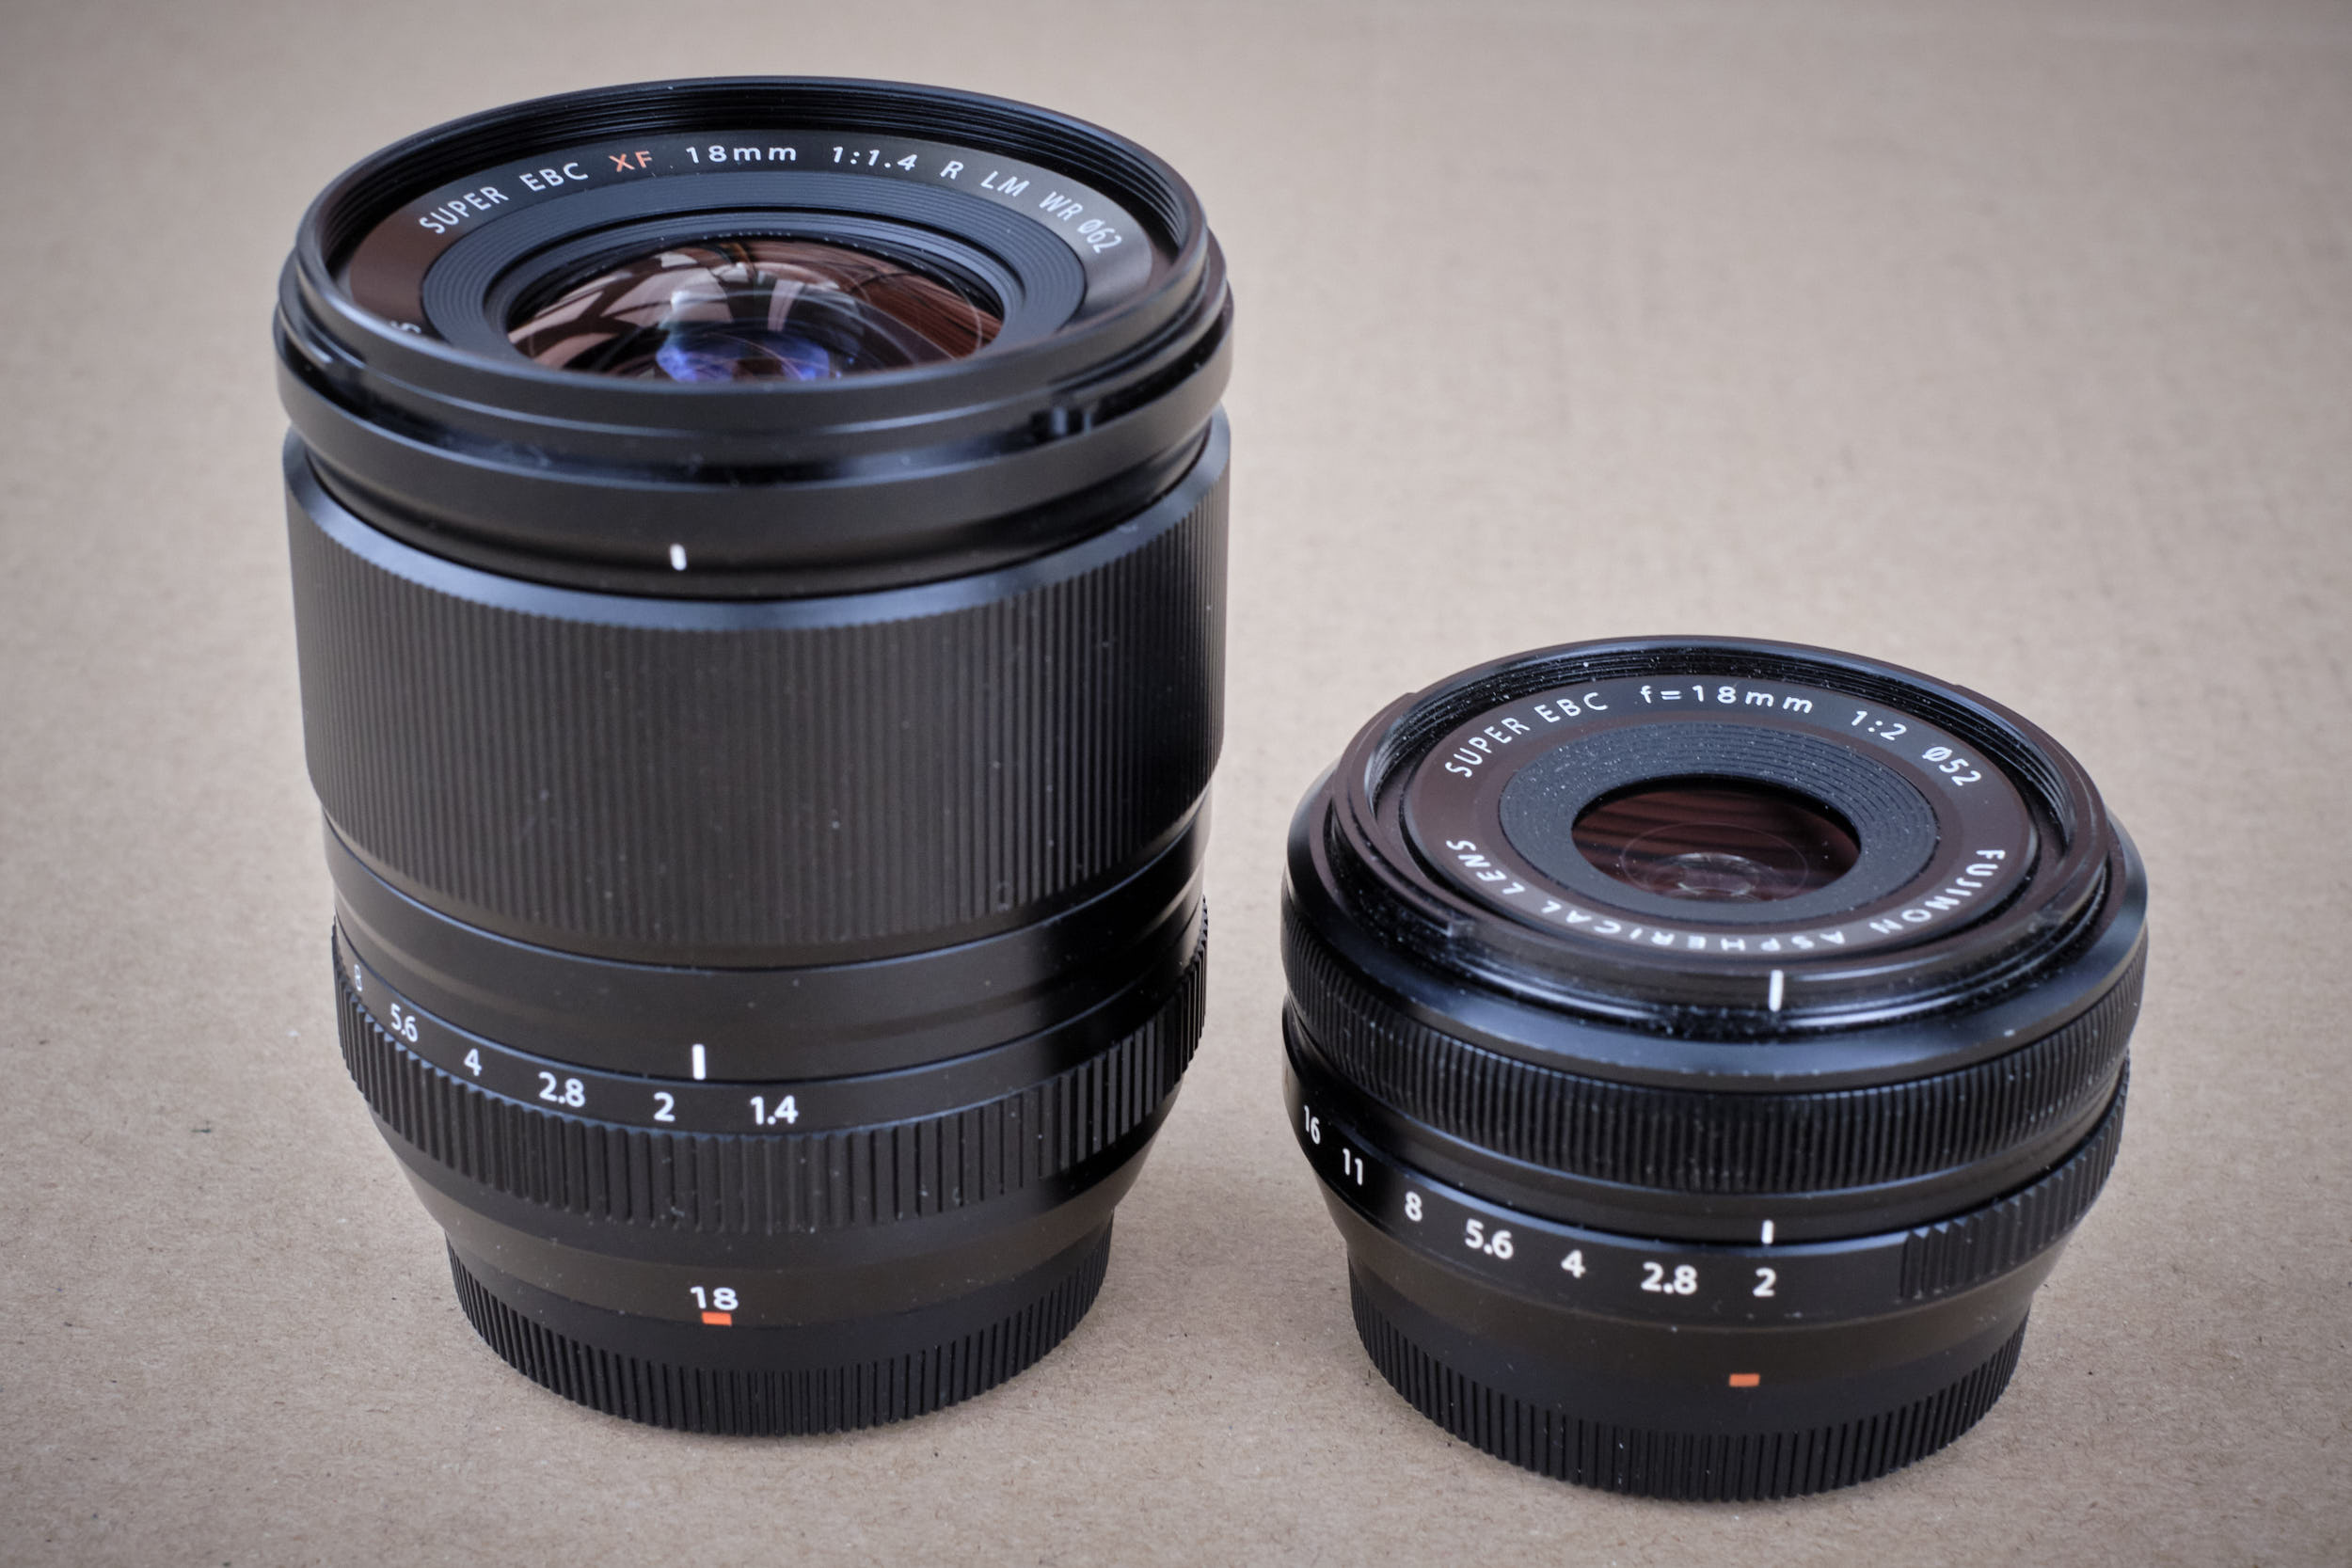 Größenvergleich XF18mm/f1,4 R LM WR zu XF18mm/f2